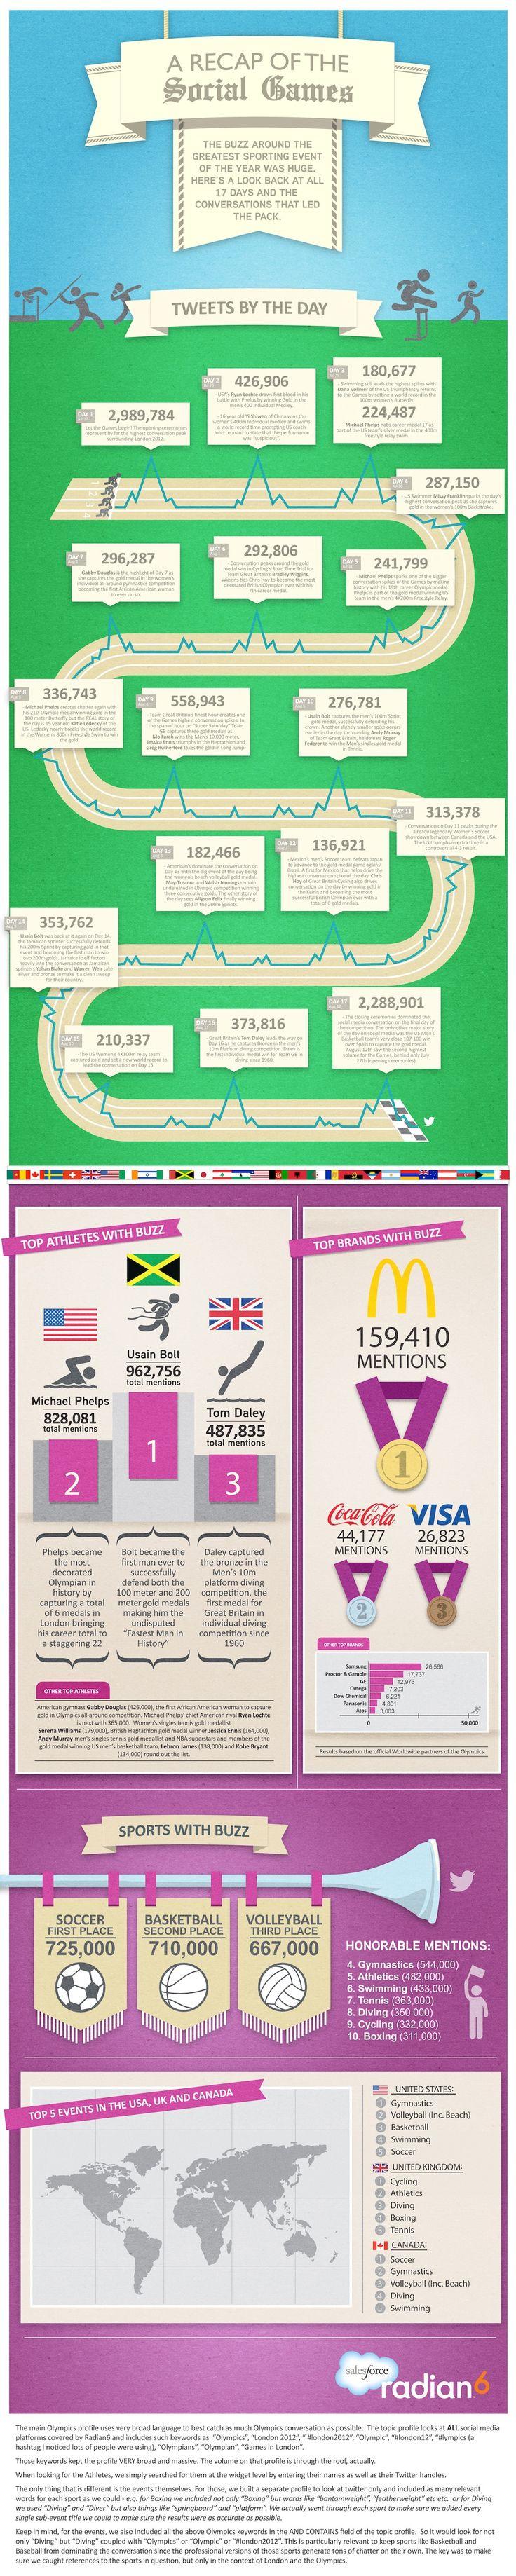 2012 Olympics: The Social Media Winners